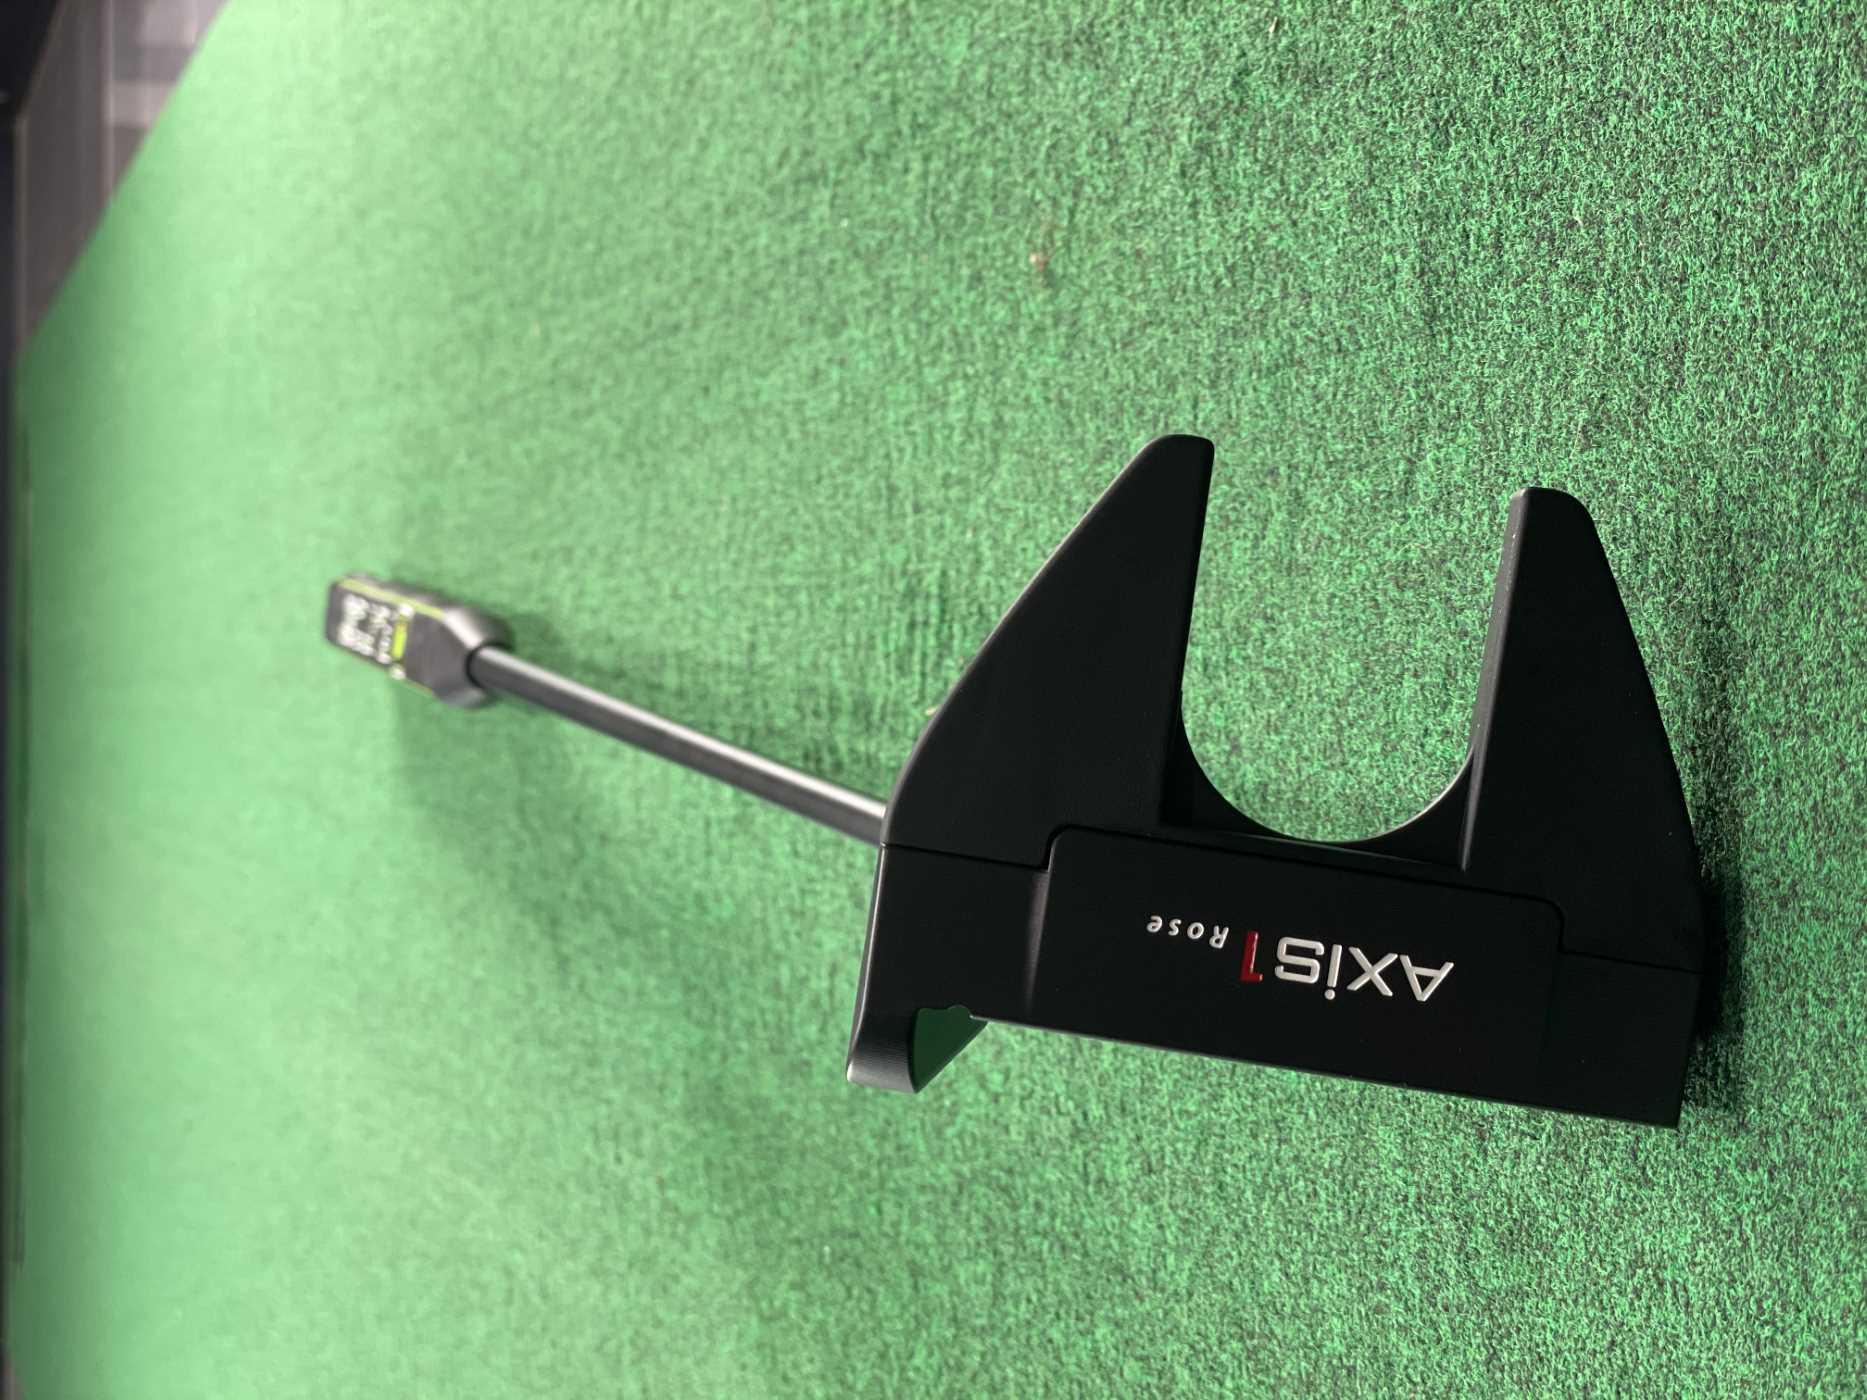 Custom AXIS1 Rose Putter